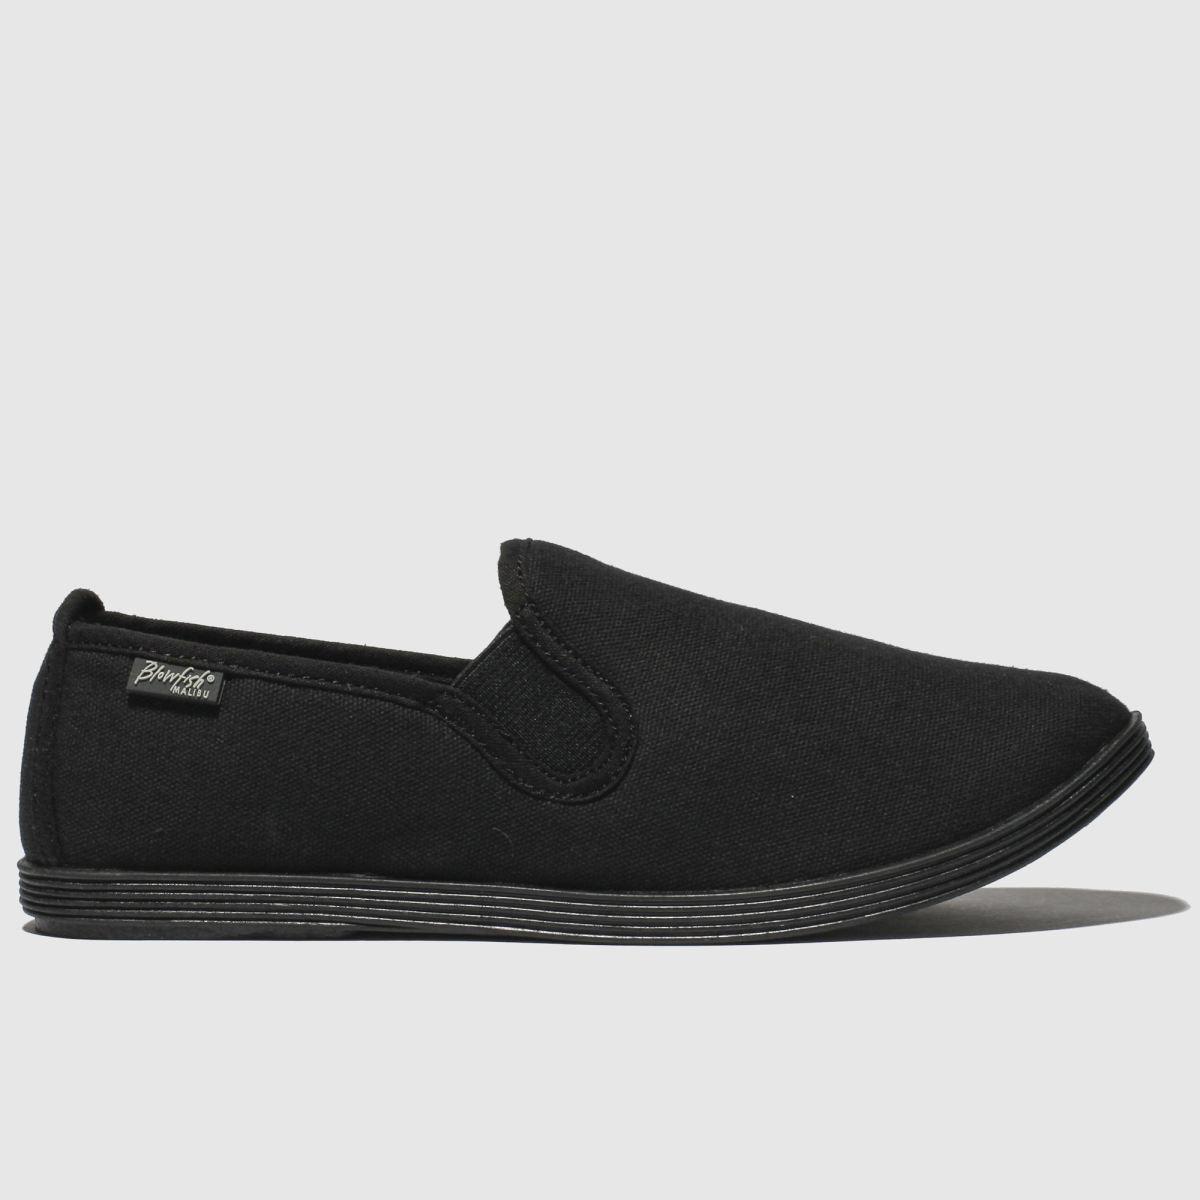 Blowfish Malibu Black Gadget Flat Shoes